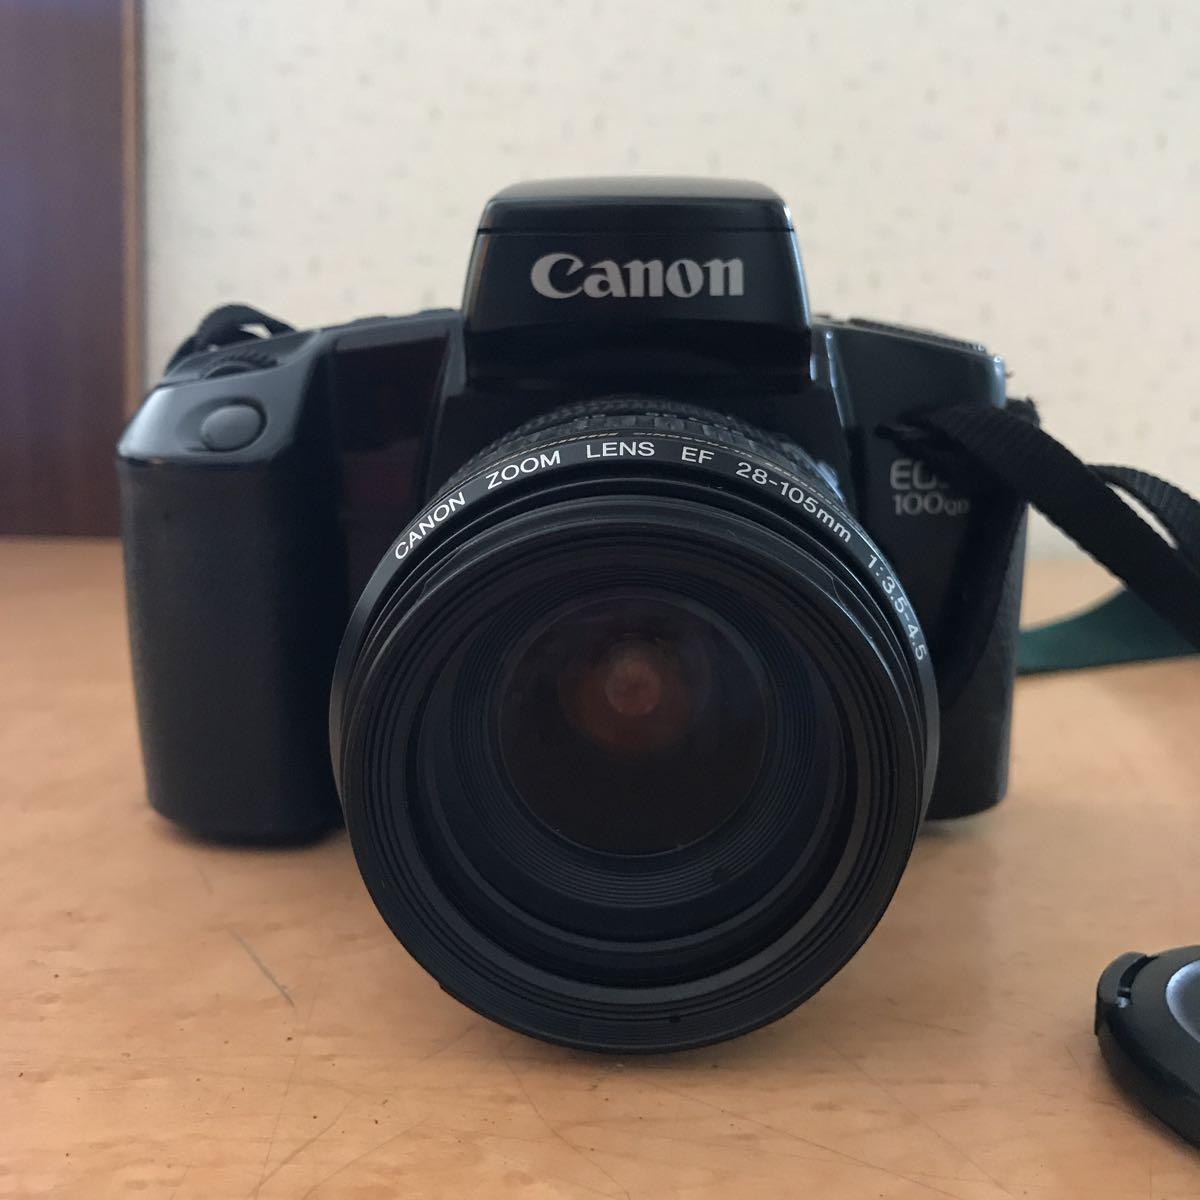 ☆【CANON】キャノン EOS100QD EF 28-105mm 1:3.5-4.5☆_画像2